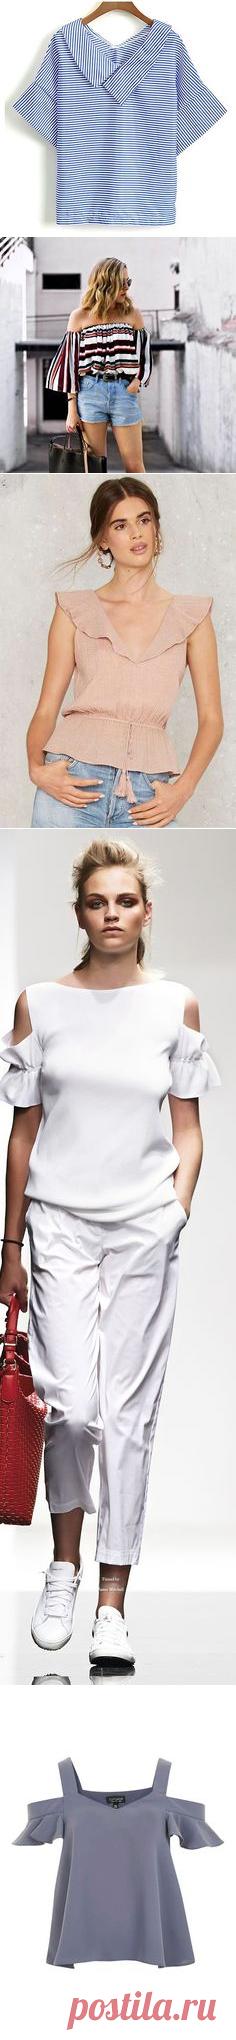 (1) Blusas в Pinterest